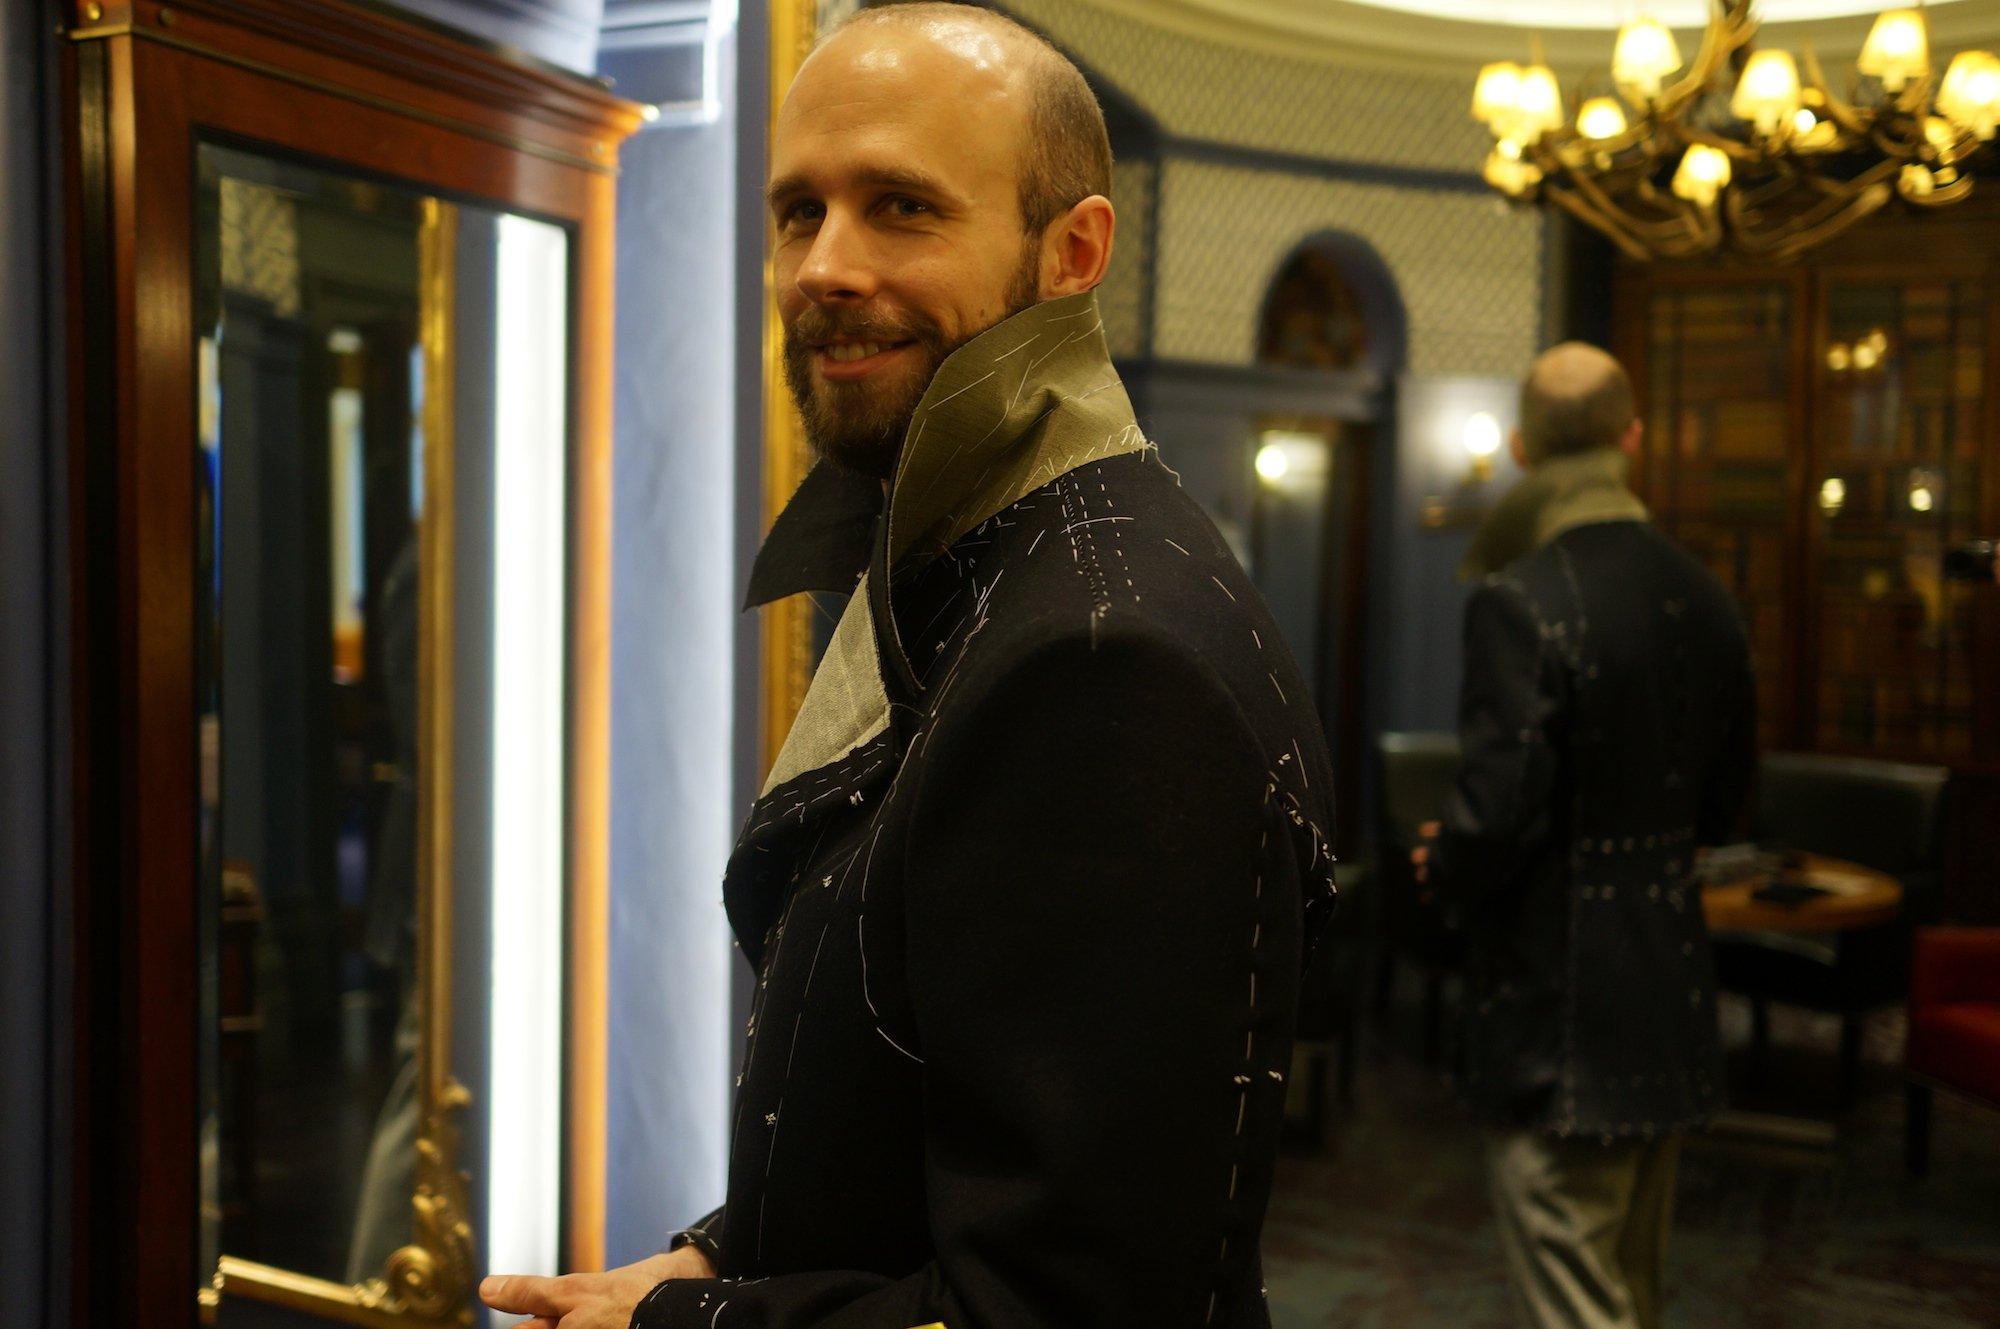 The bespoke pea coat   Part 2 - Permanent Style